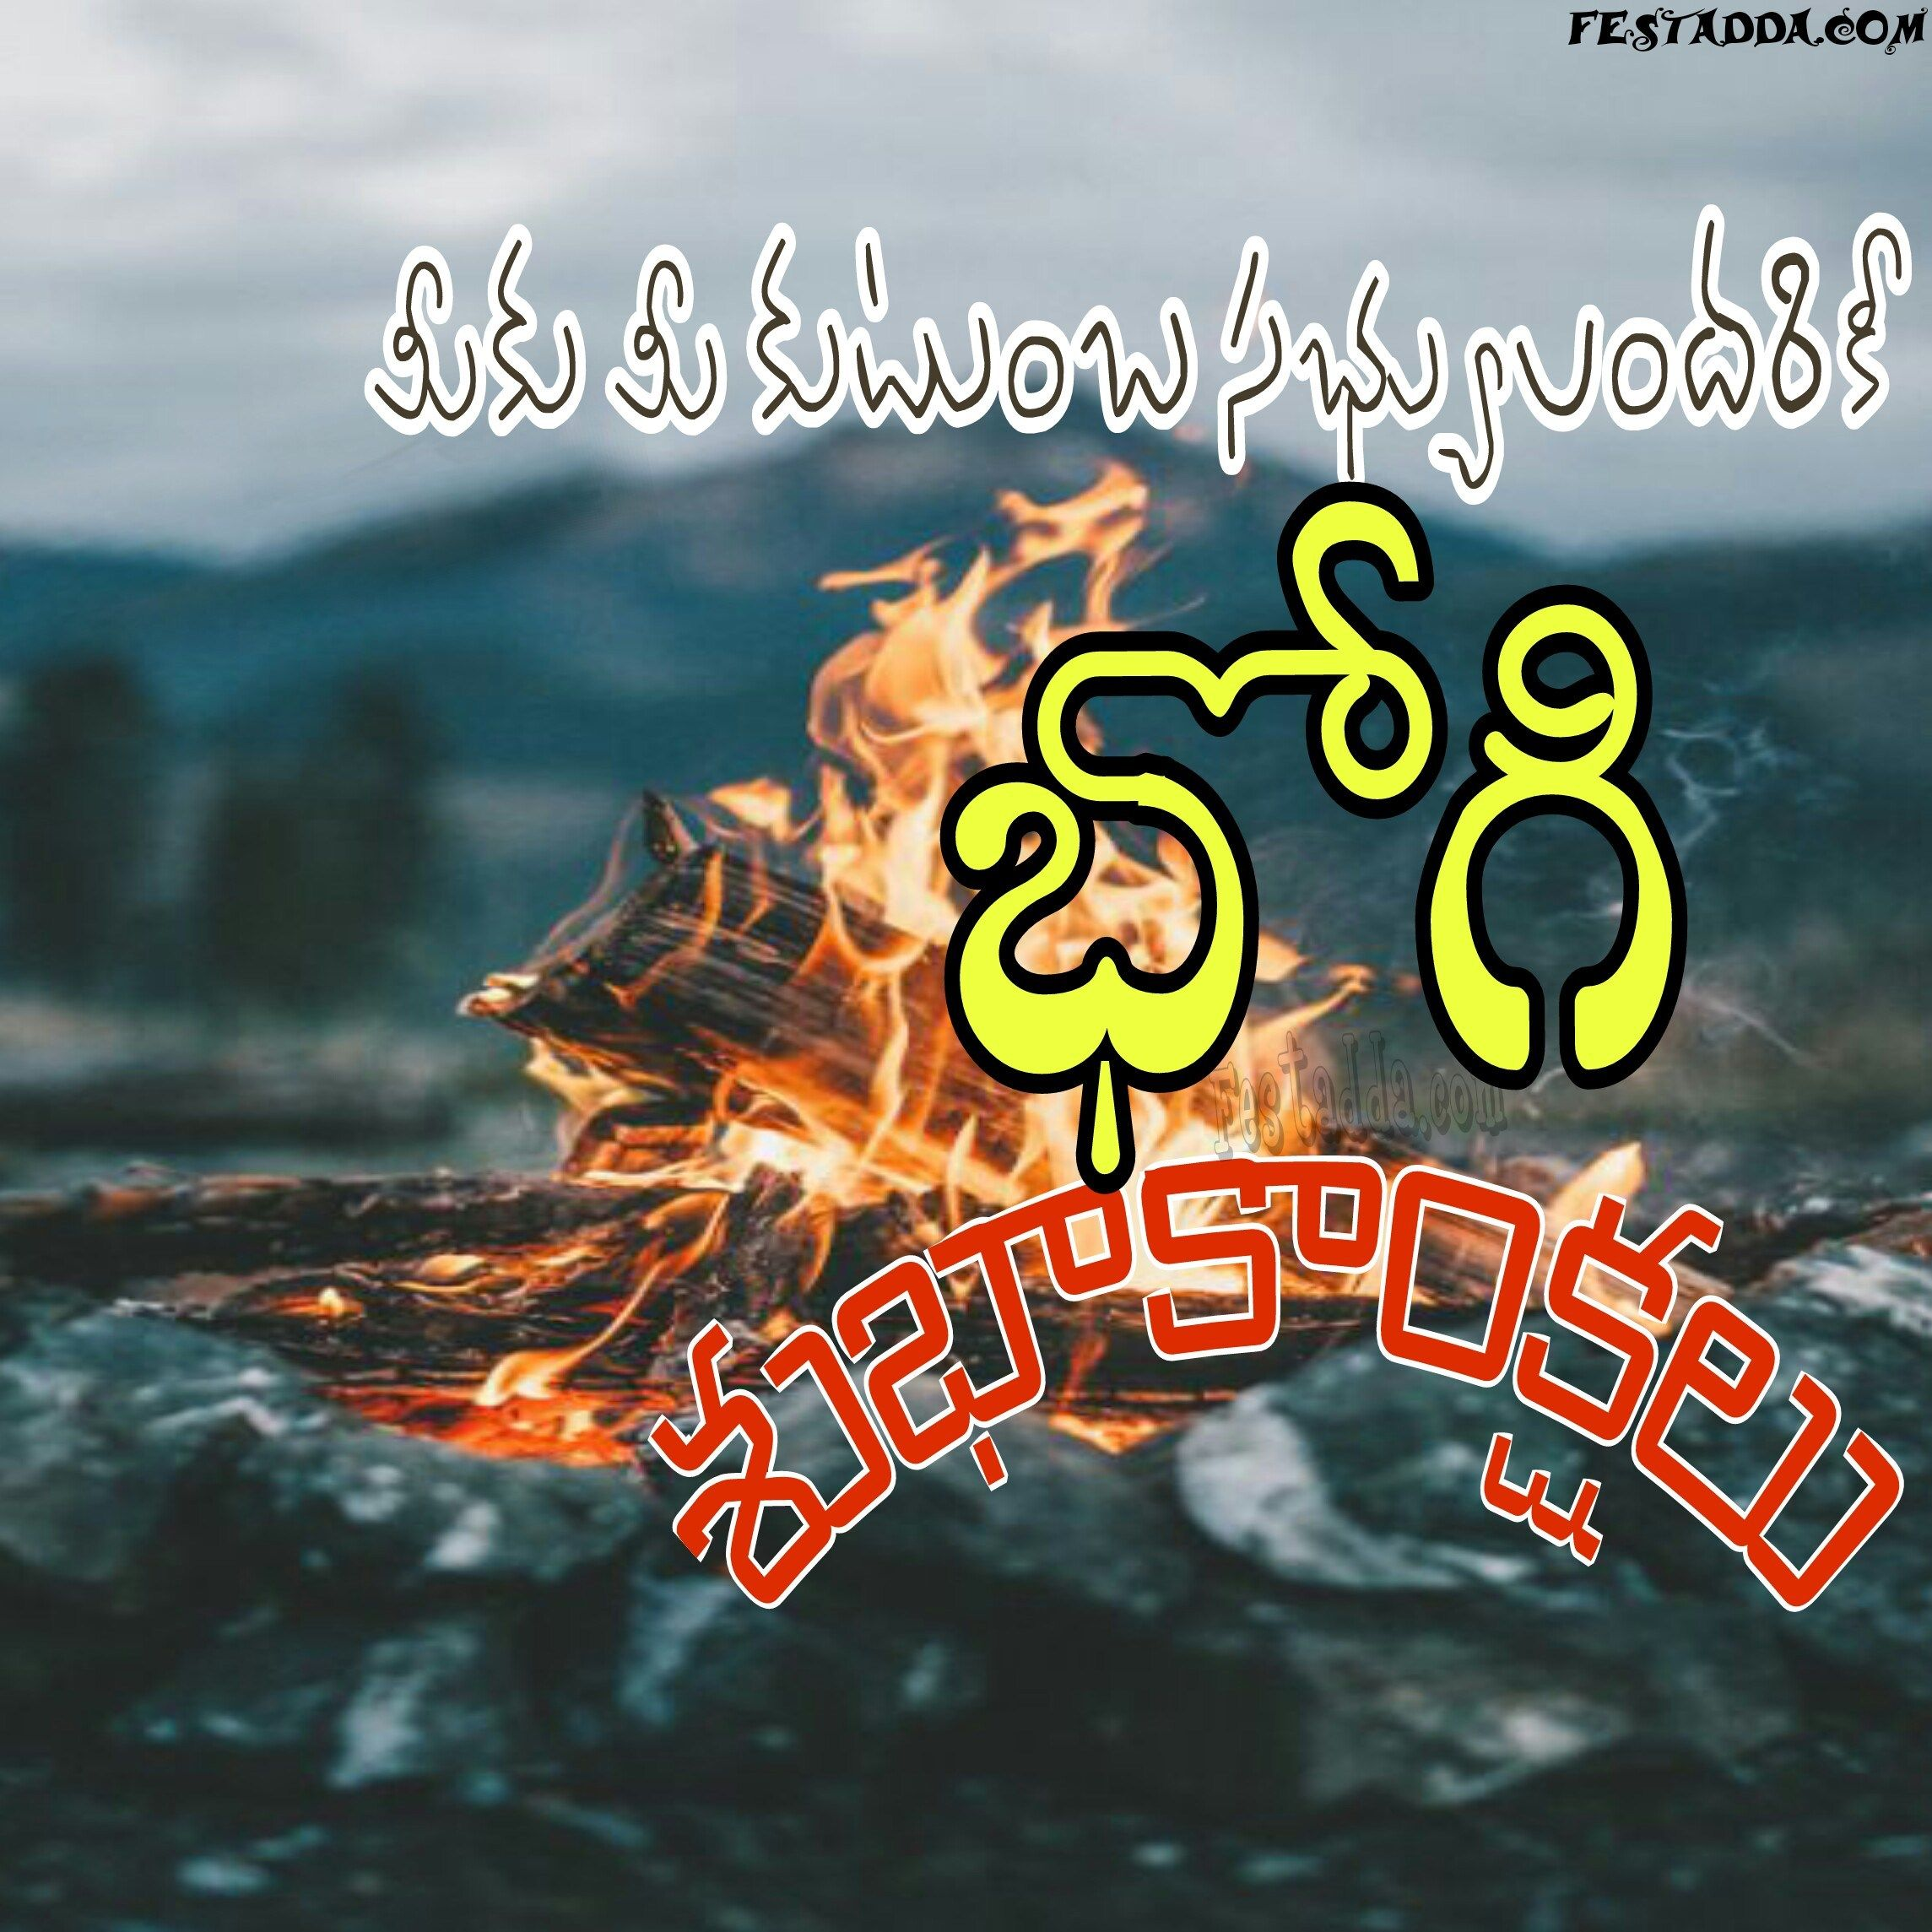 Happy Bhogi Wishes 2020 Images In Telugu Font Full HD ...